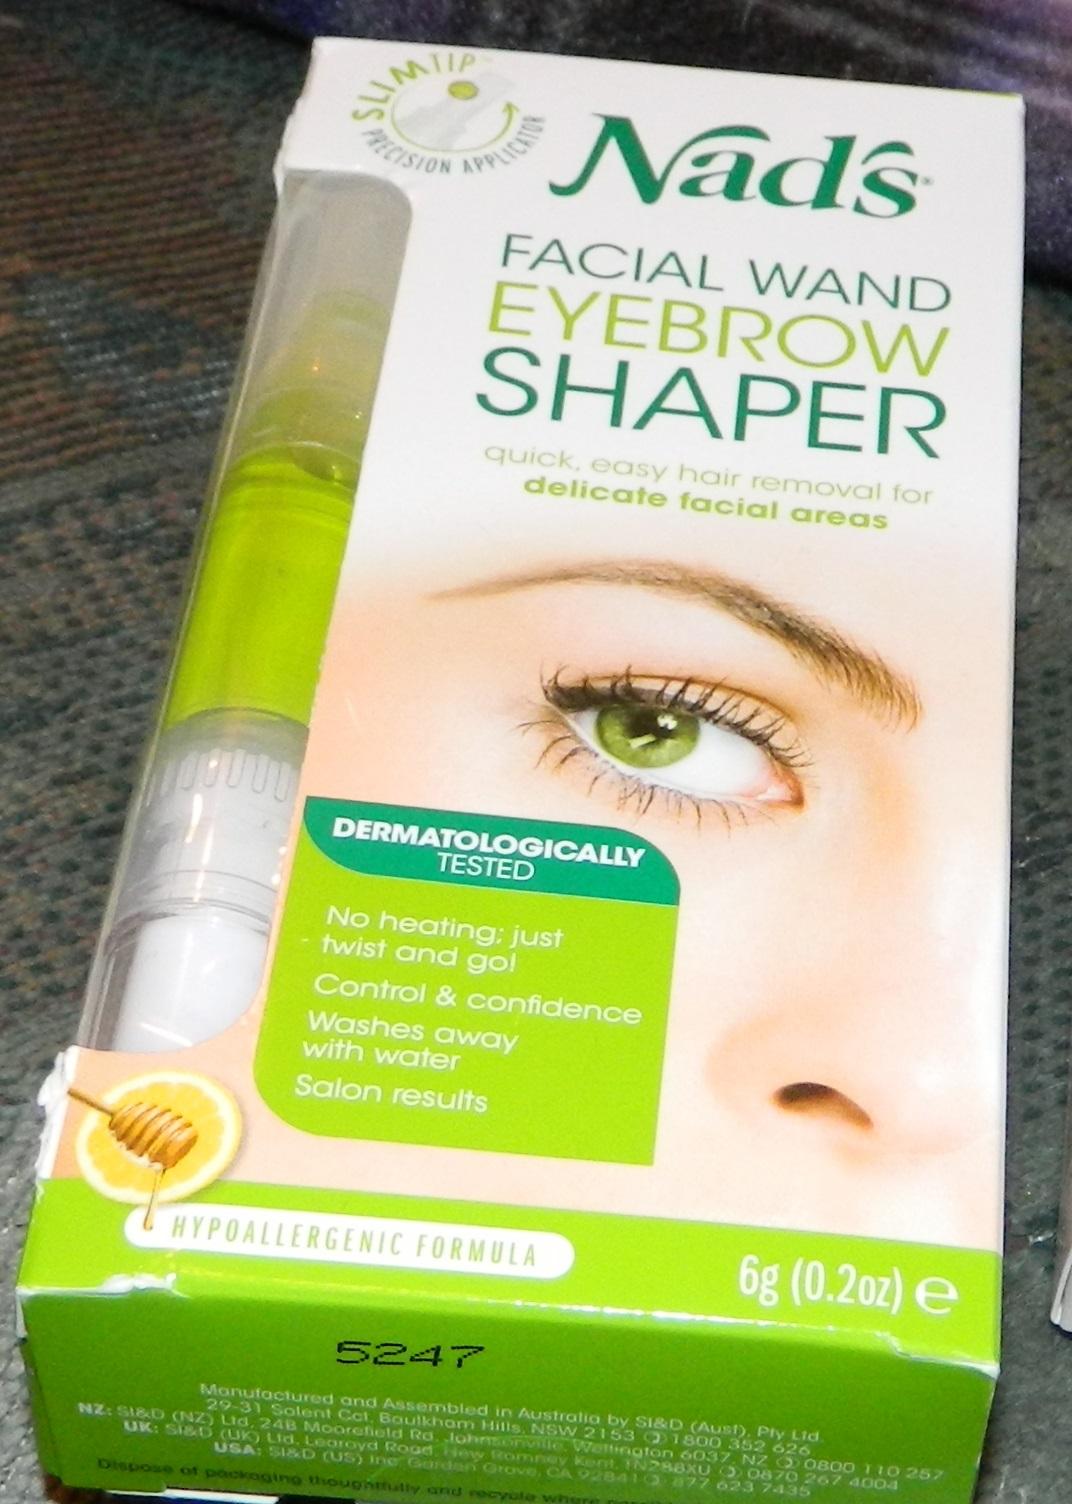 Nads Natural Hair Removal Gel Facial Wand Saralees Deals Steals